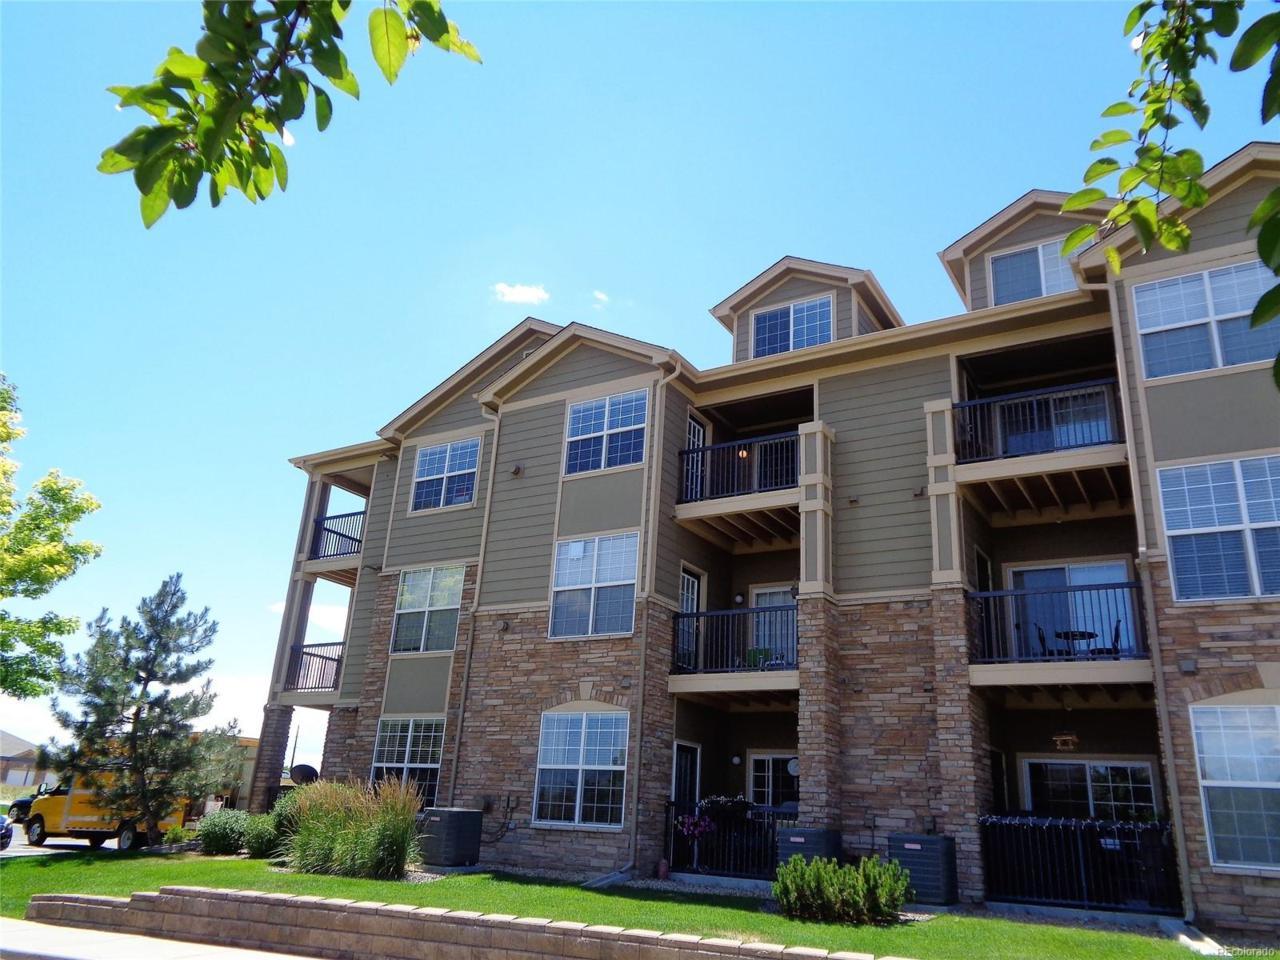 9142 Lodestar Lane #307, Parker, CO 80134 (MLS #9503024) :: 8z Real Estate